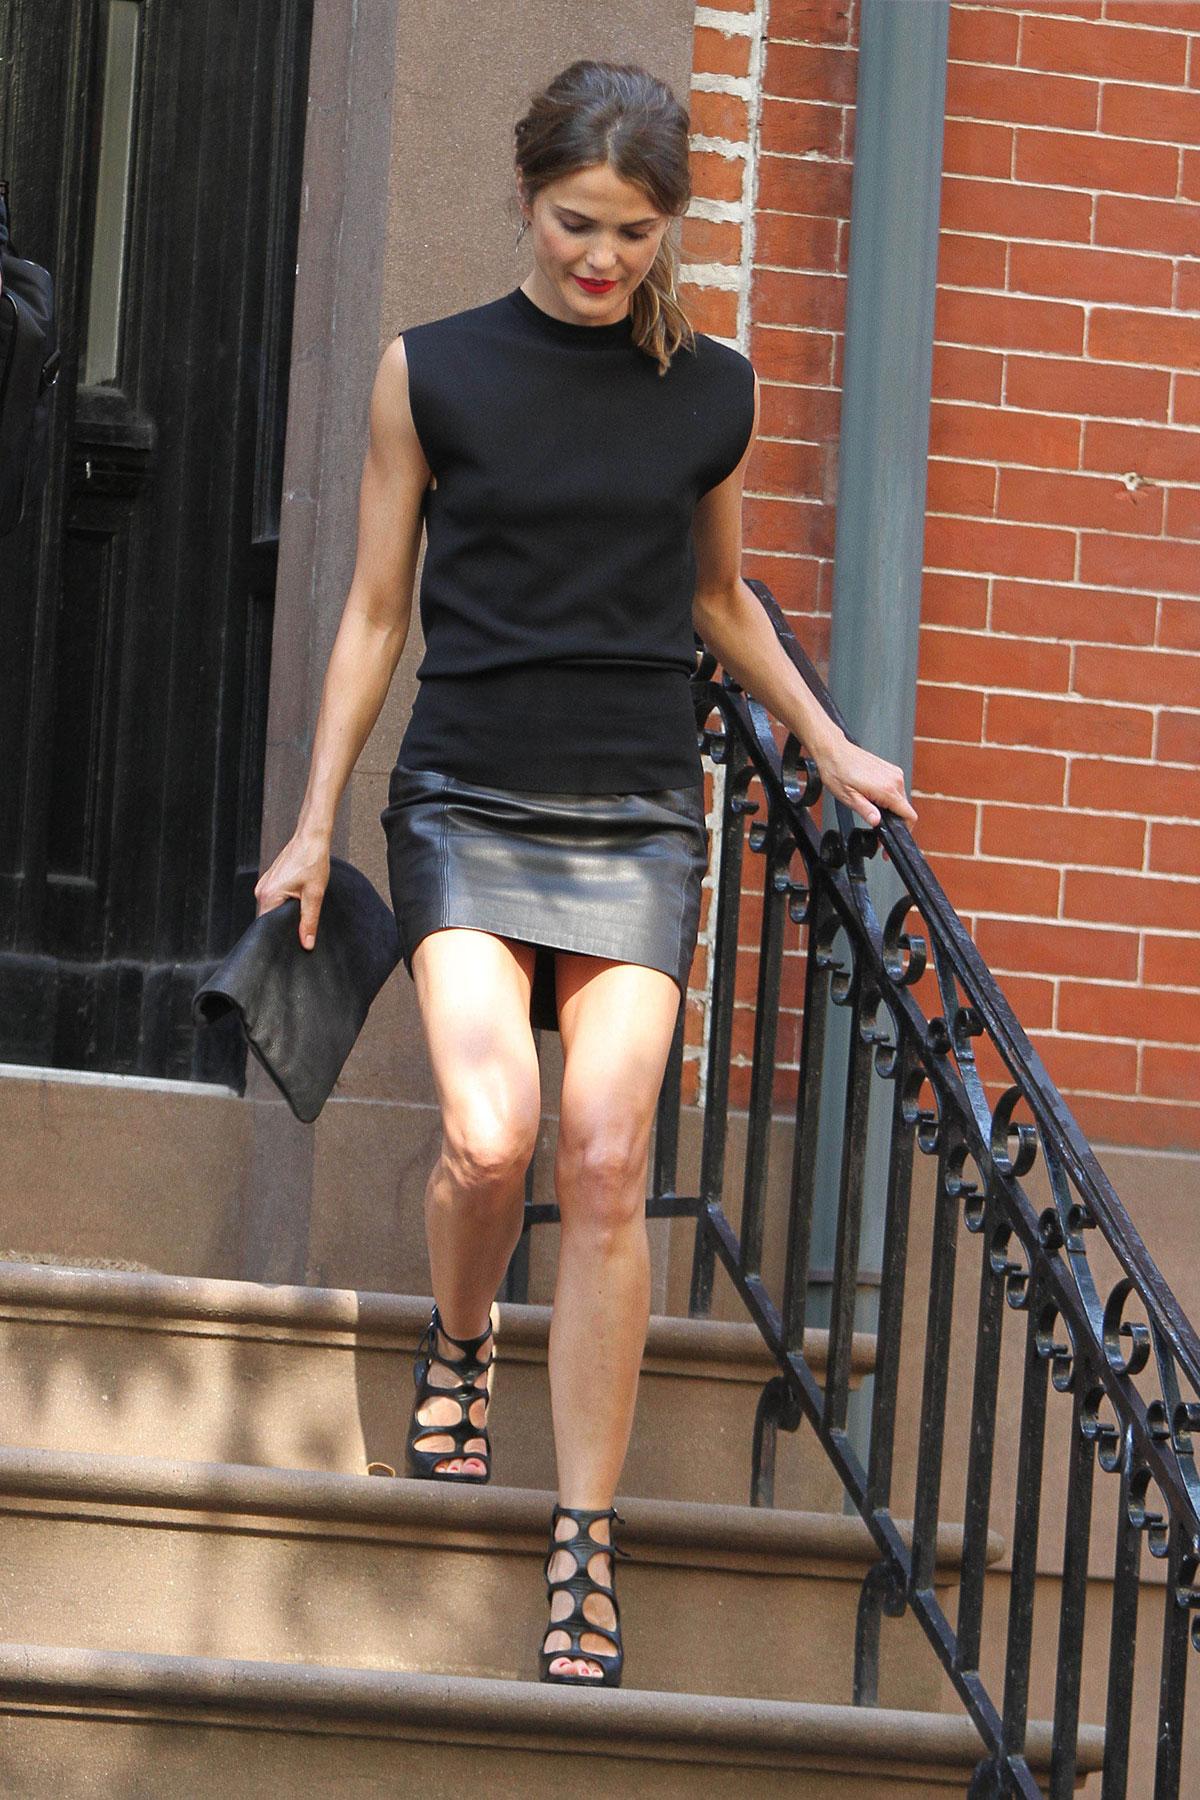 Keri Russell leaving her home in Brooklyn